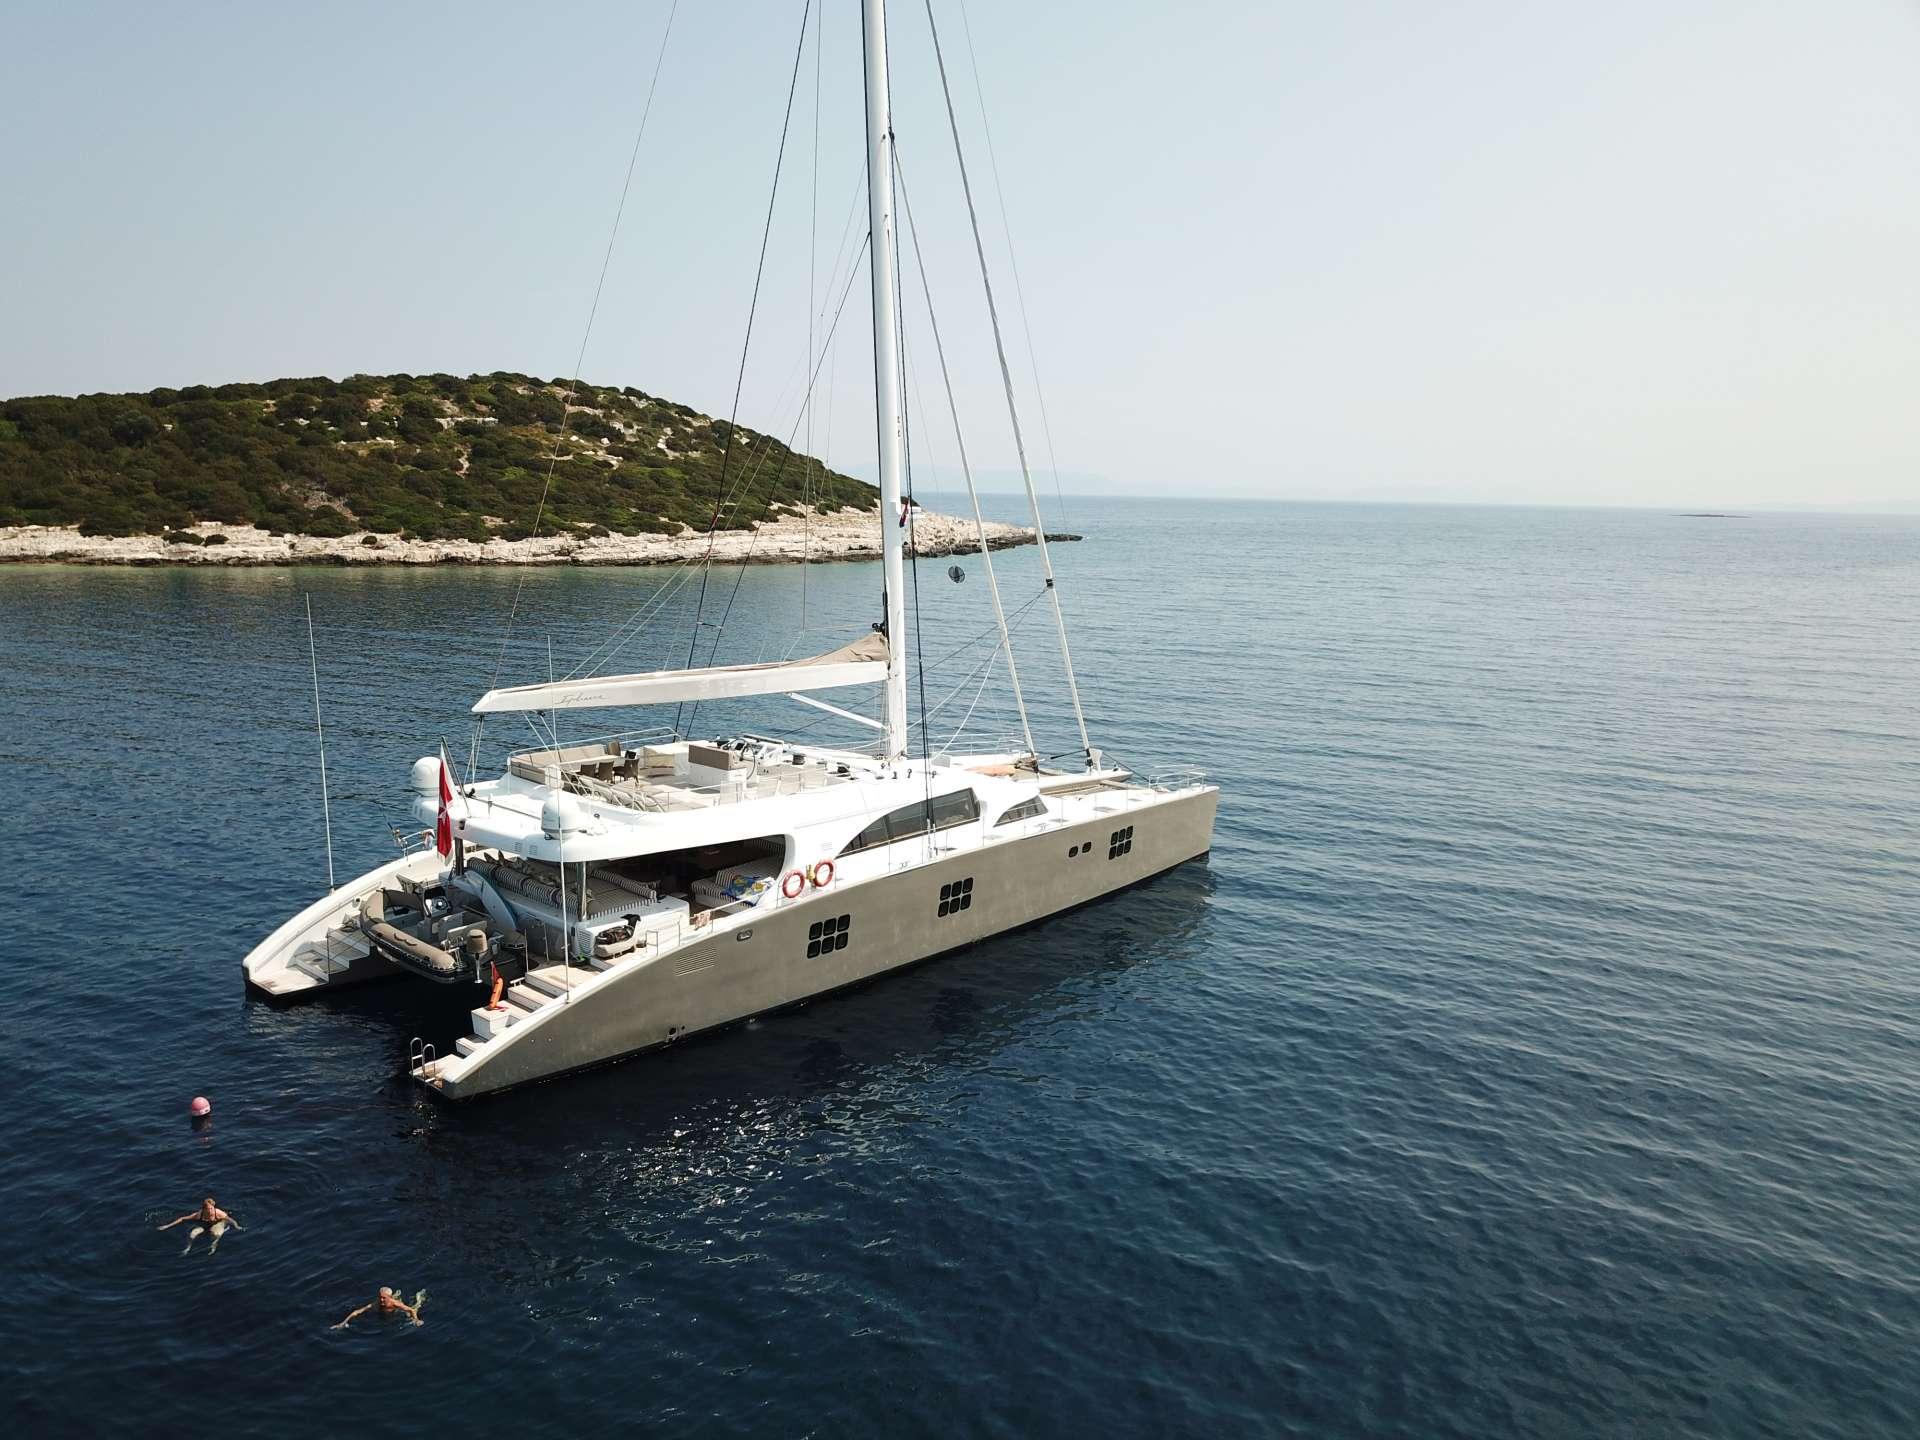 Main image of IPHARRA yacht